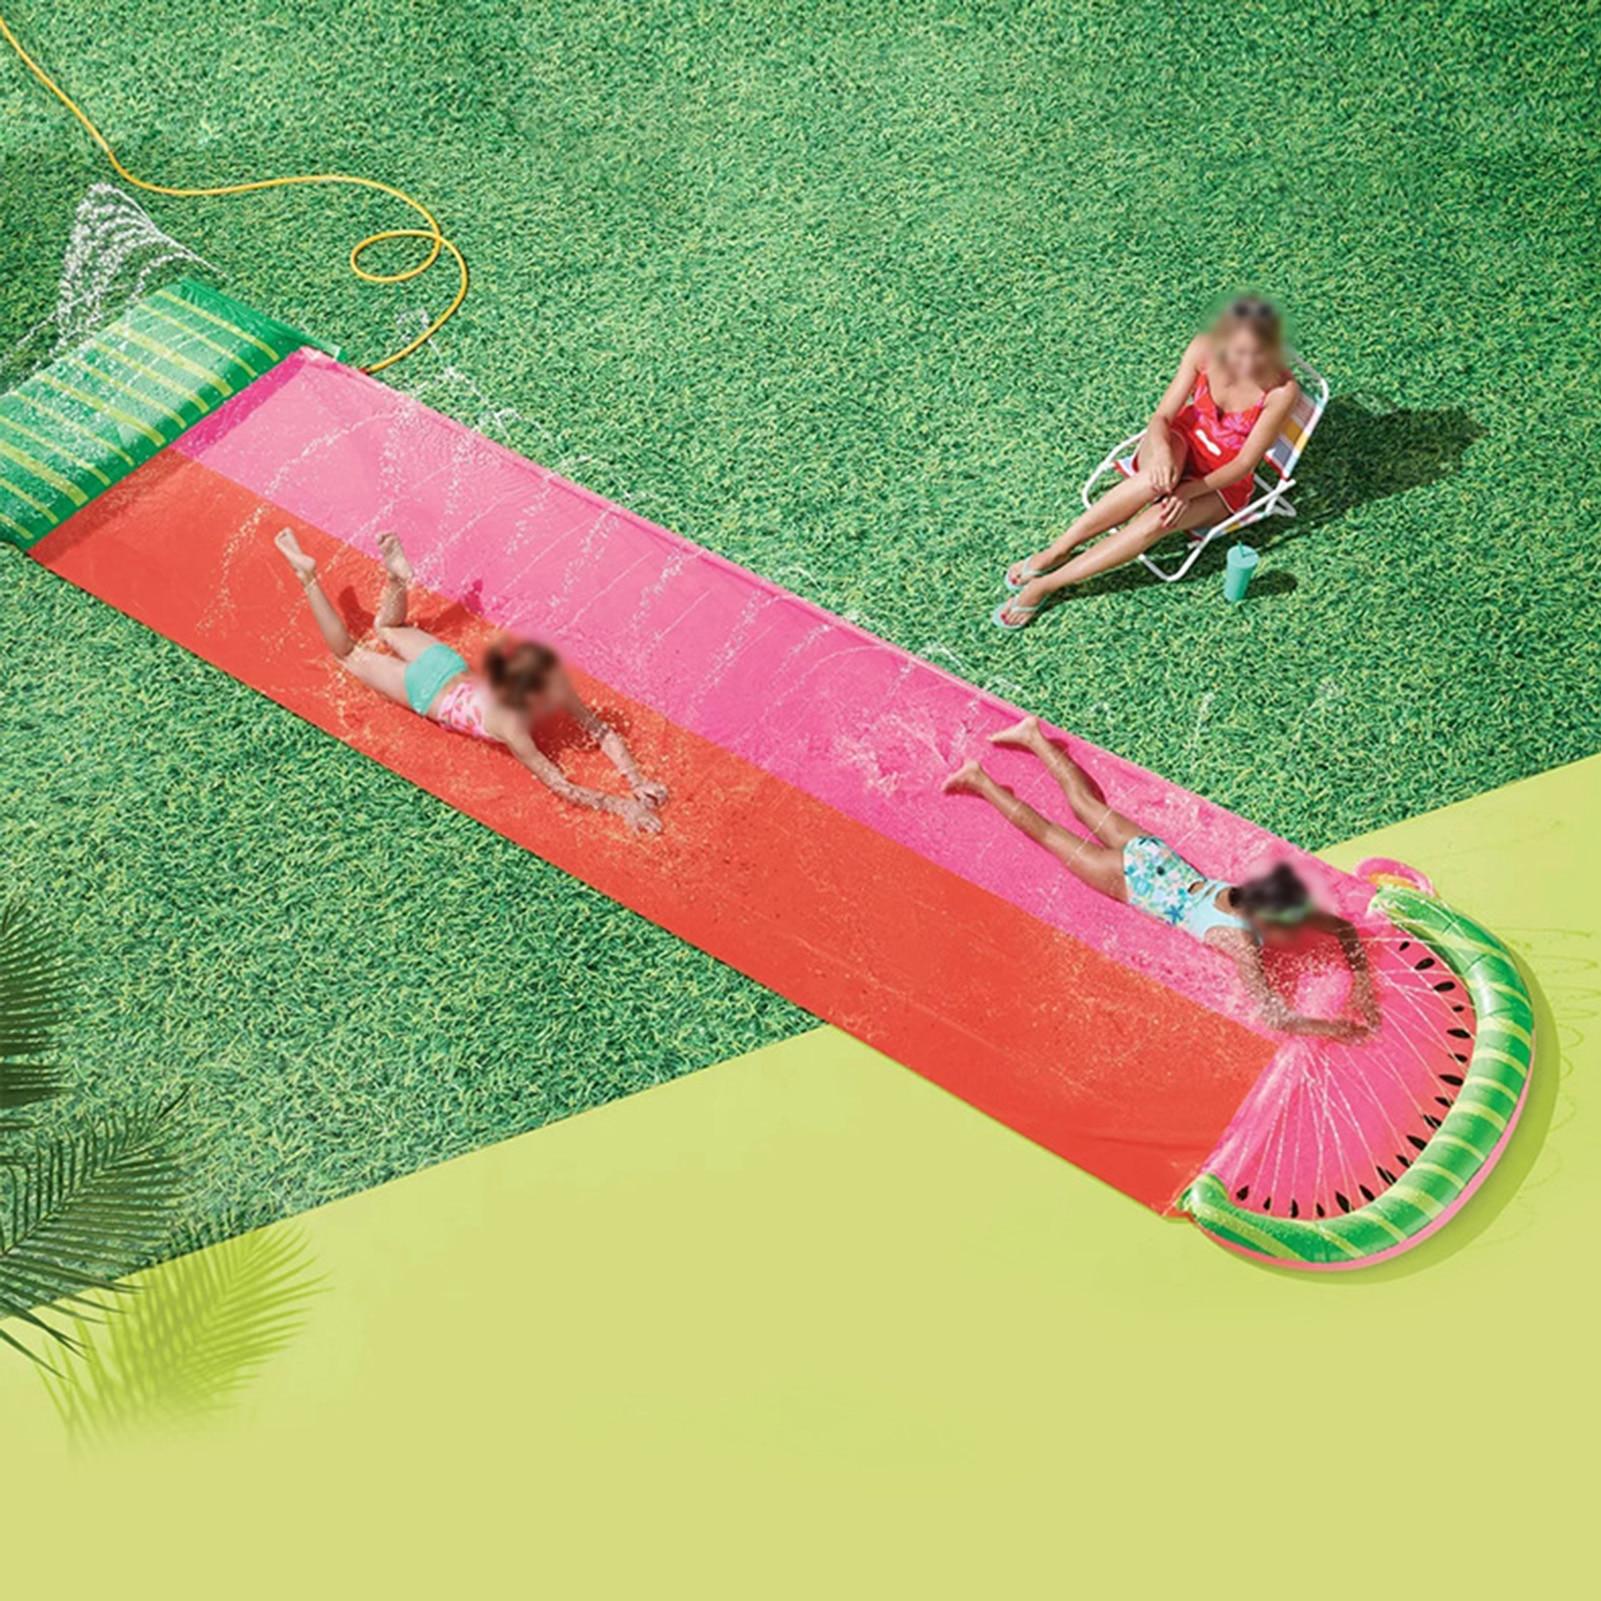 Kid Water Slide Fun Lawn Water Slide Inflatable Crash Pad Safe Water Slide Spray Paddling Pool Surf Summer PVC Games Center